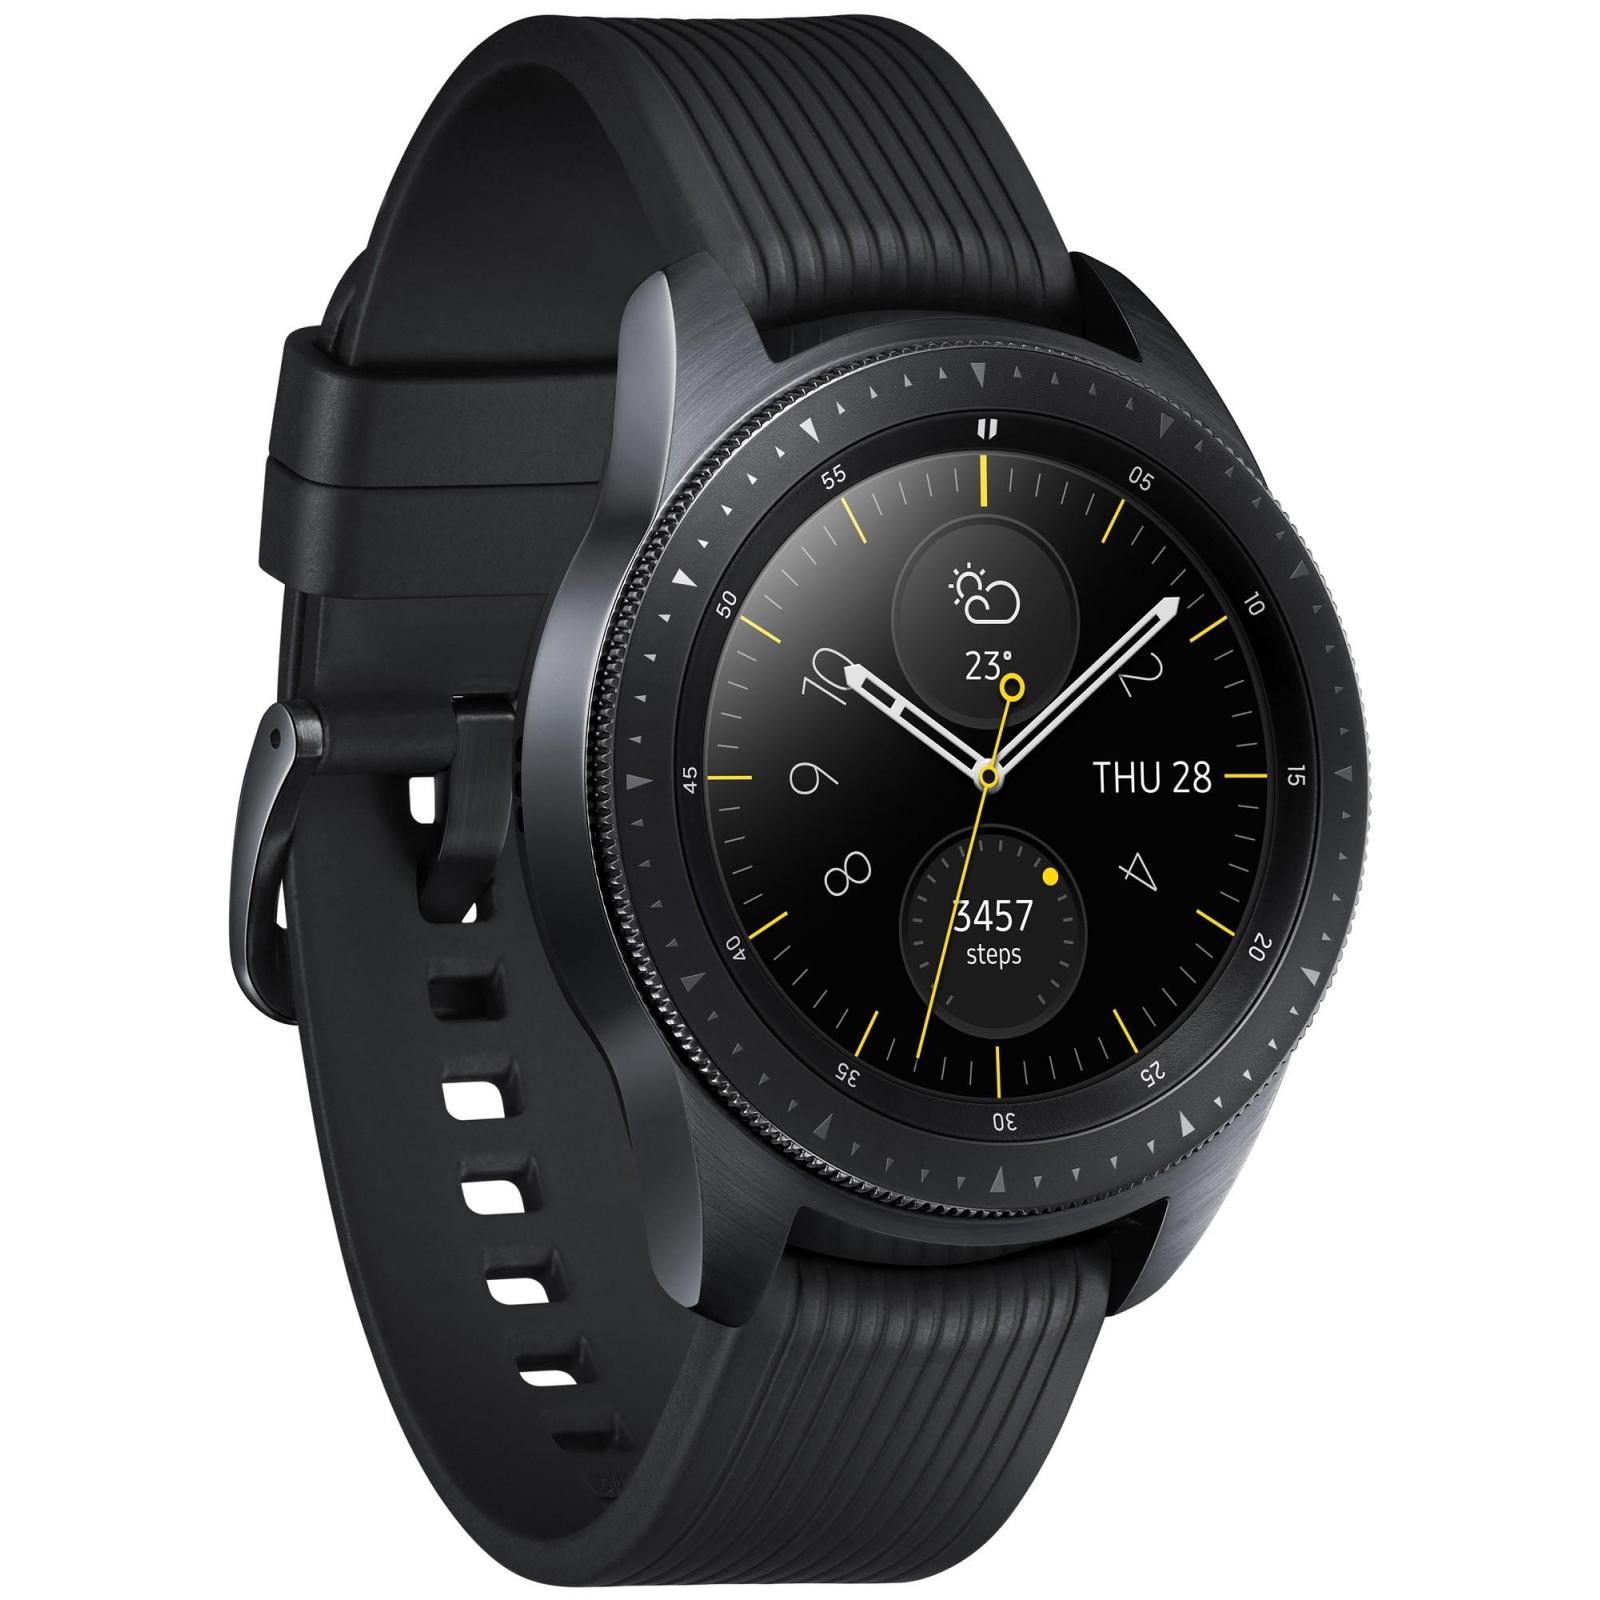 Смарт-часы Samsung SM-R810 Galaxy Watch 42mm Black (SM-R810NZKASEK) изображение 2